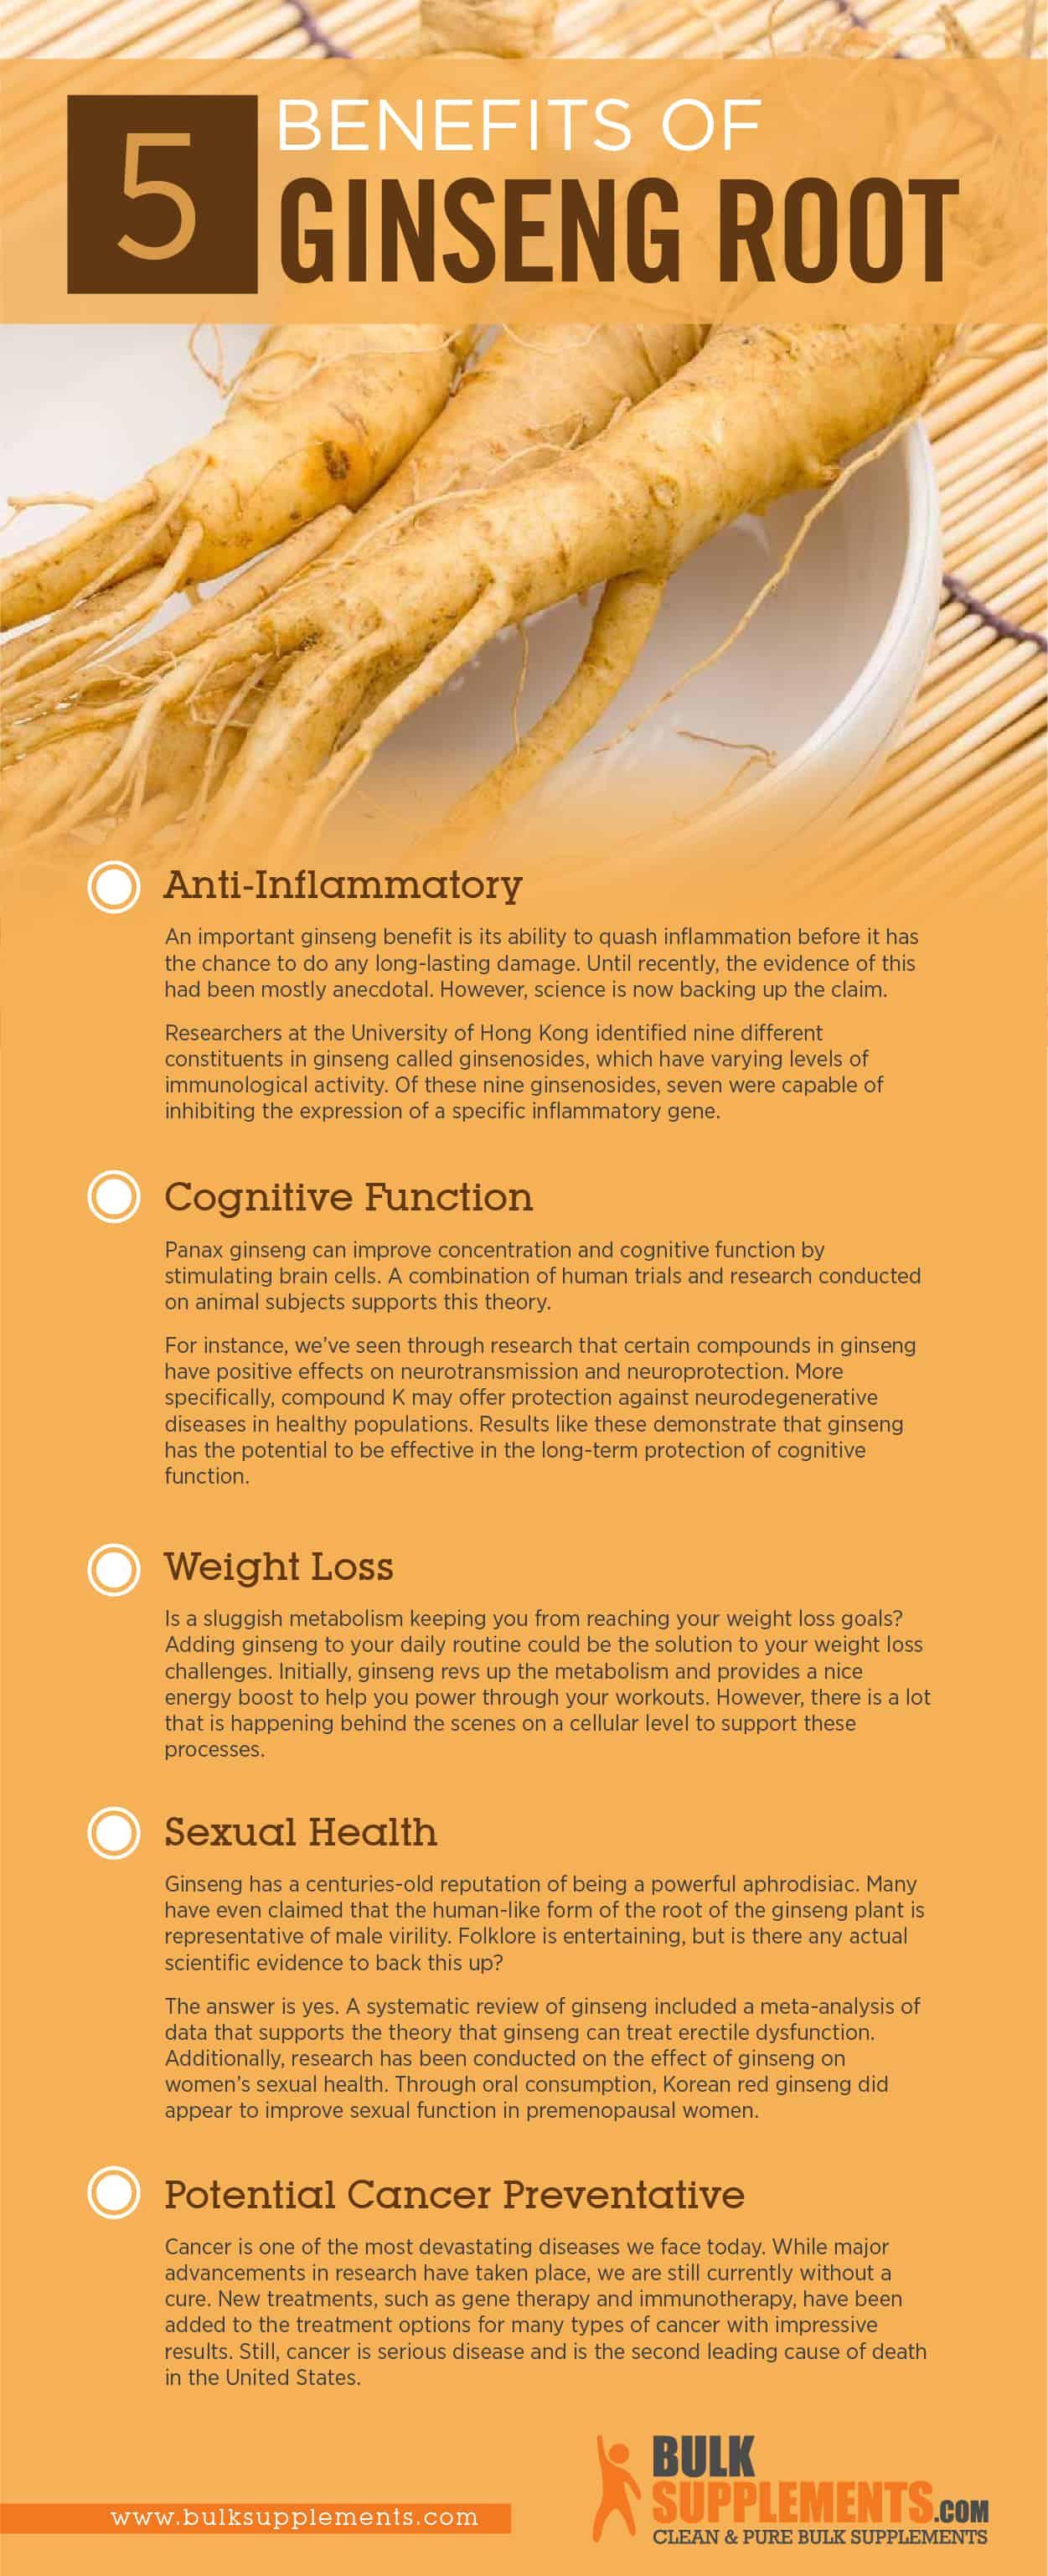 Ginseng Benefits